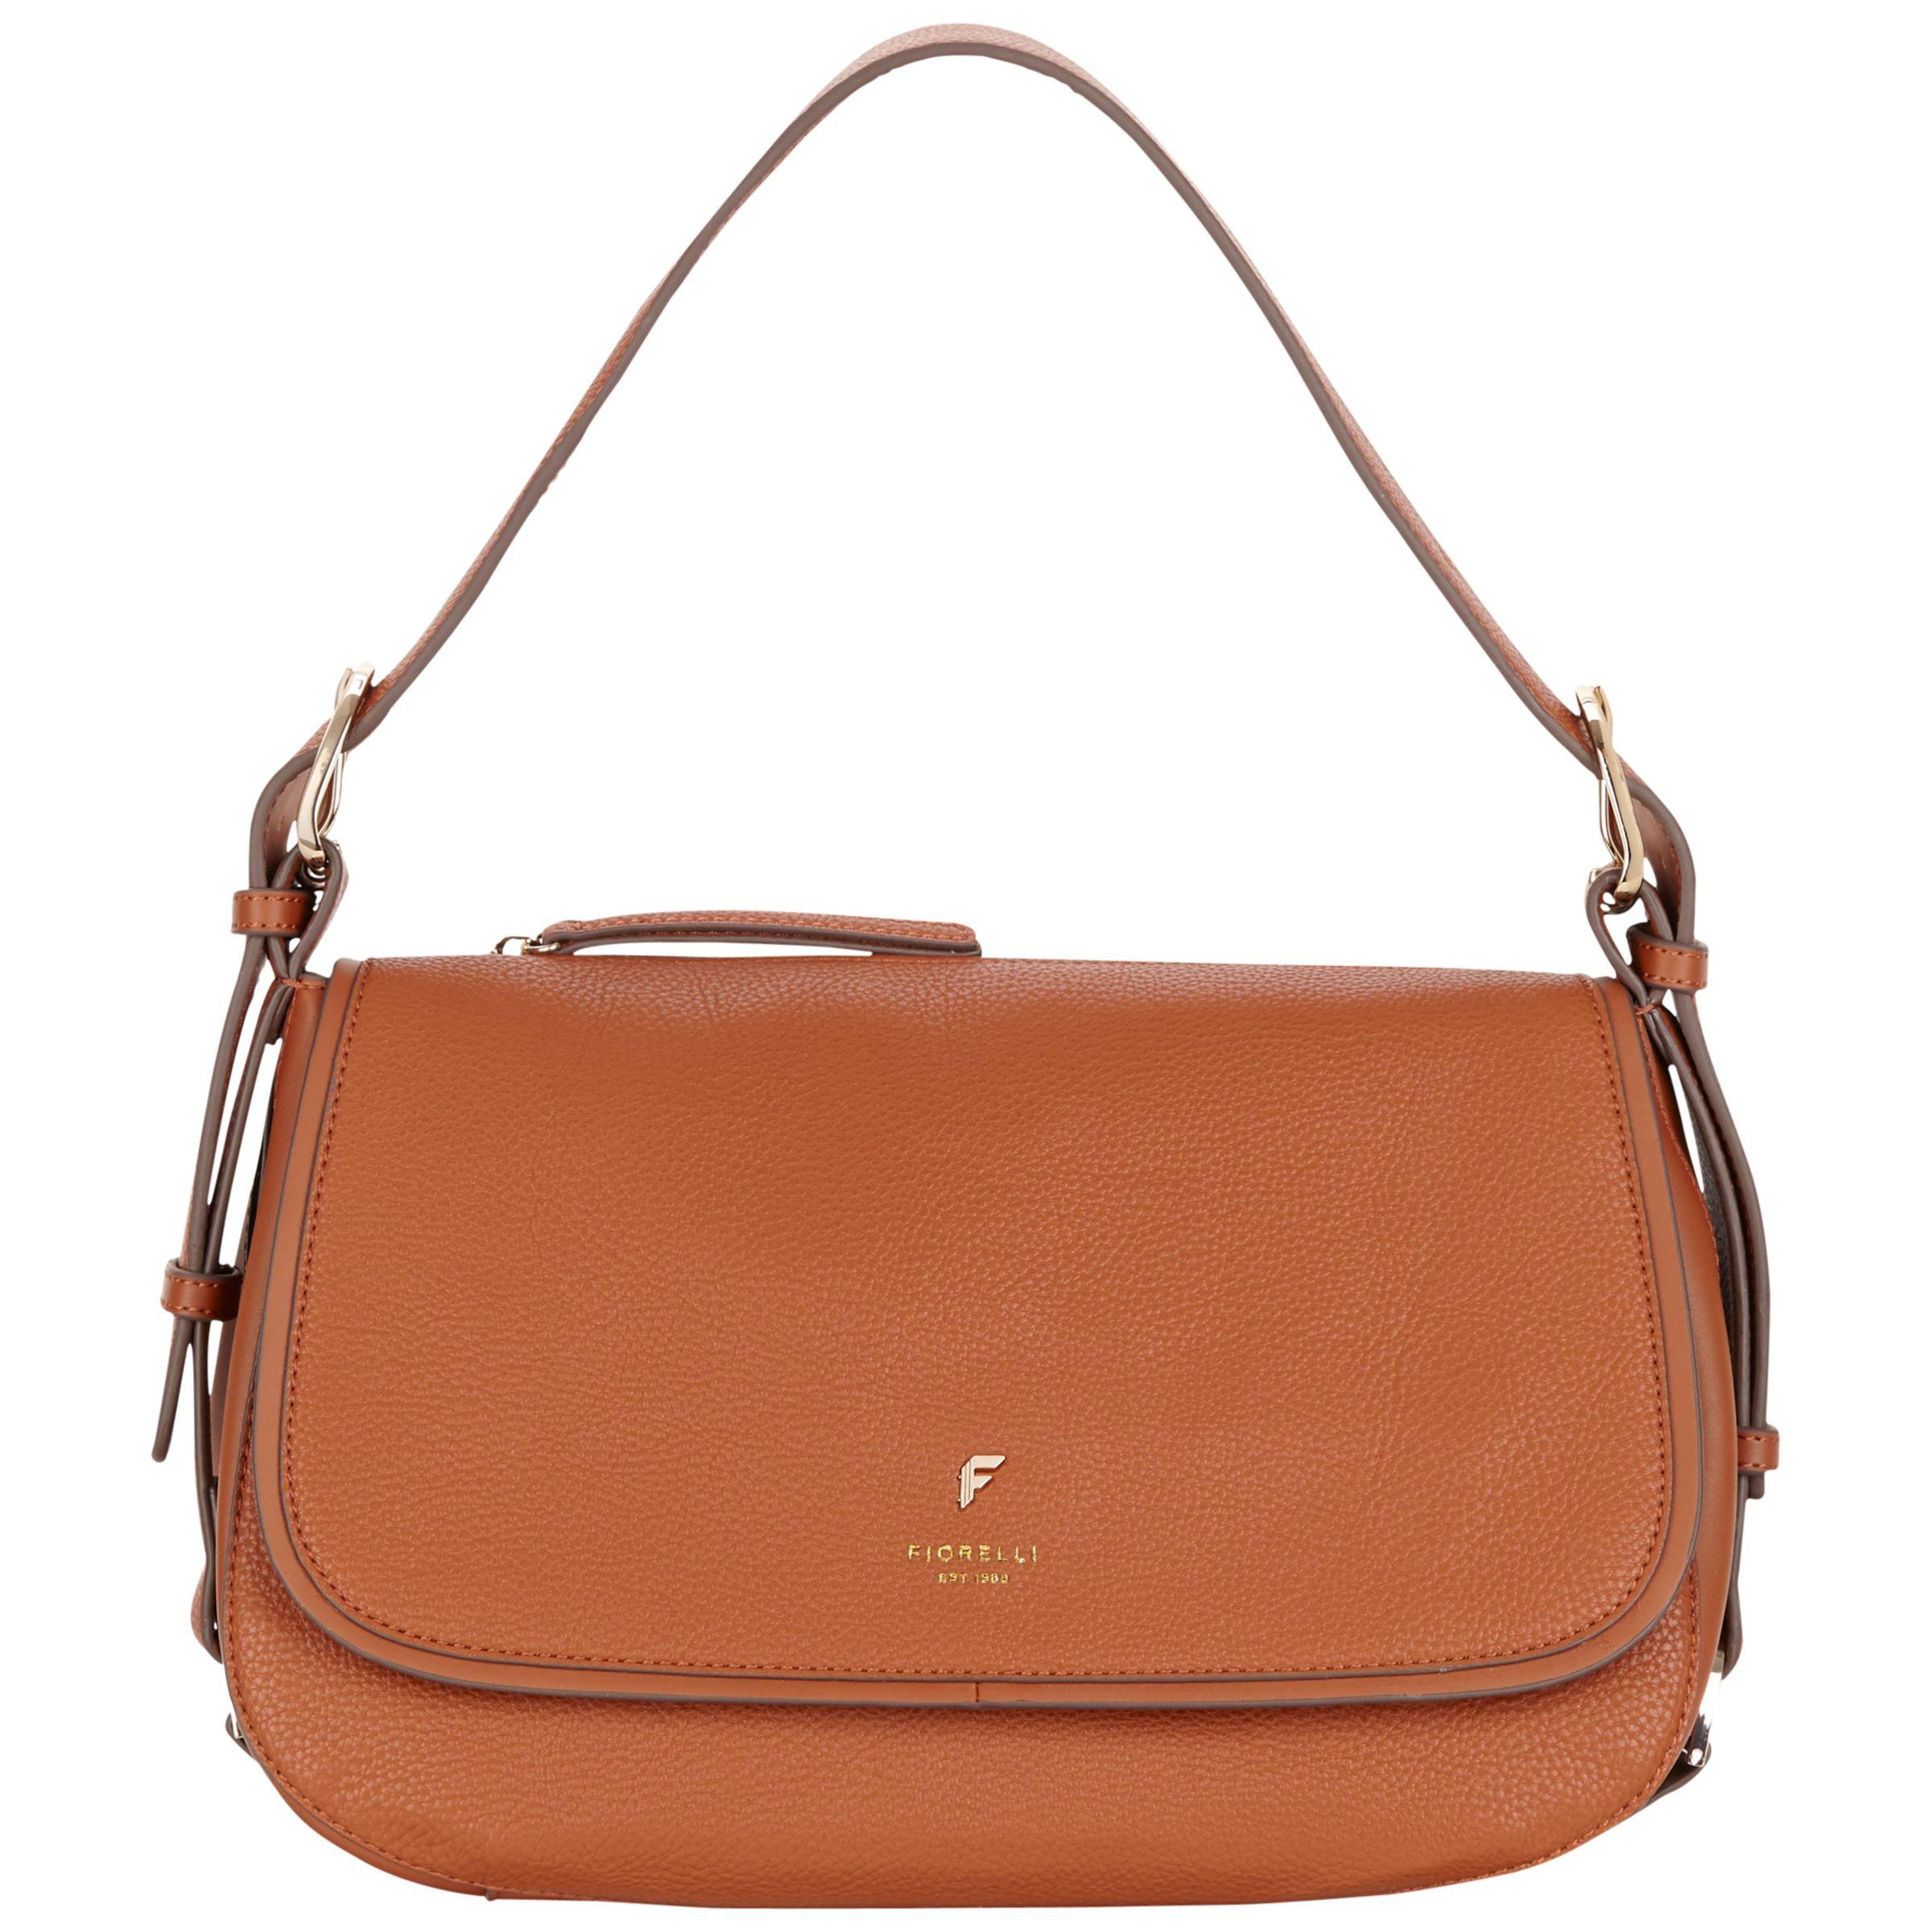 Fiorelli Fiorelli Georgia Saddle Shoulder Bag